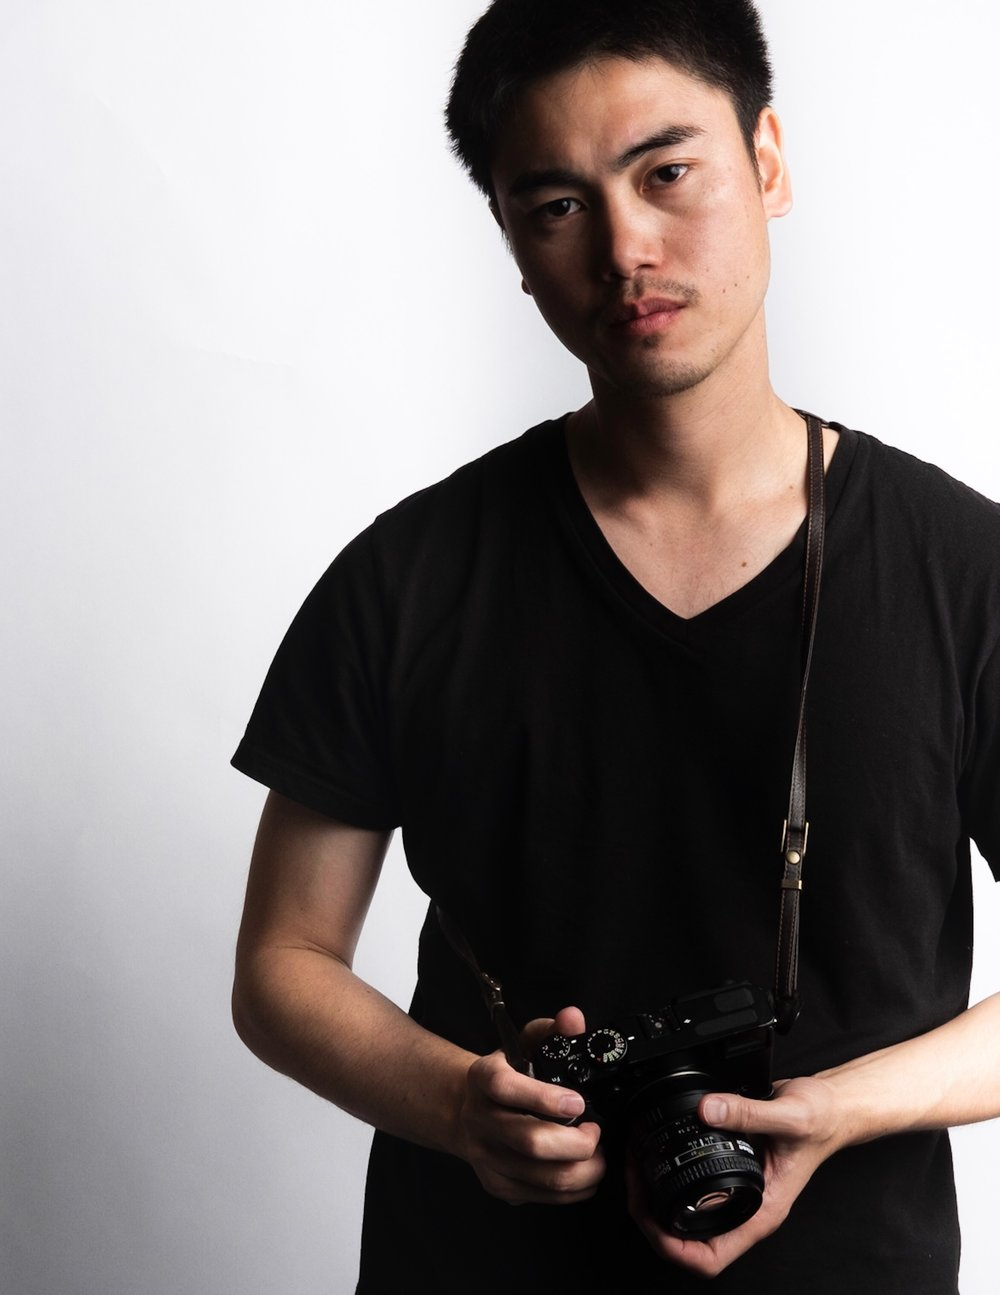 Ko Zushi Headshot.jpg